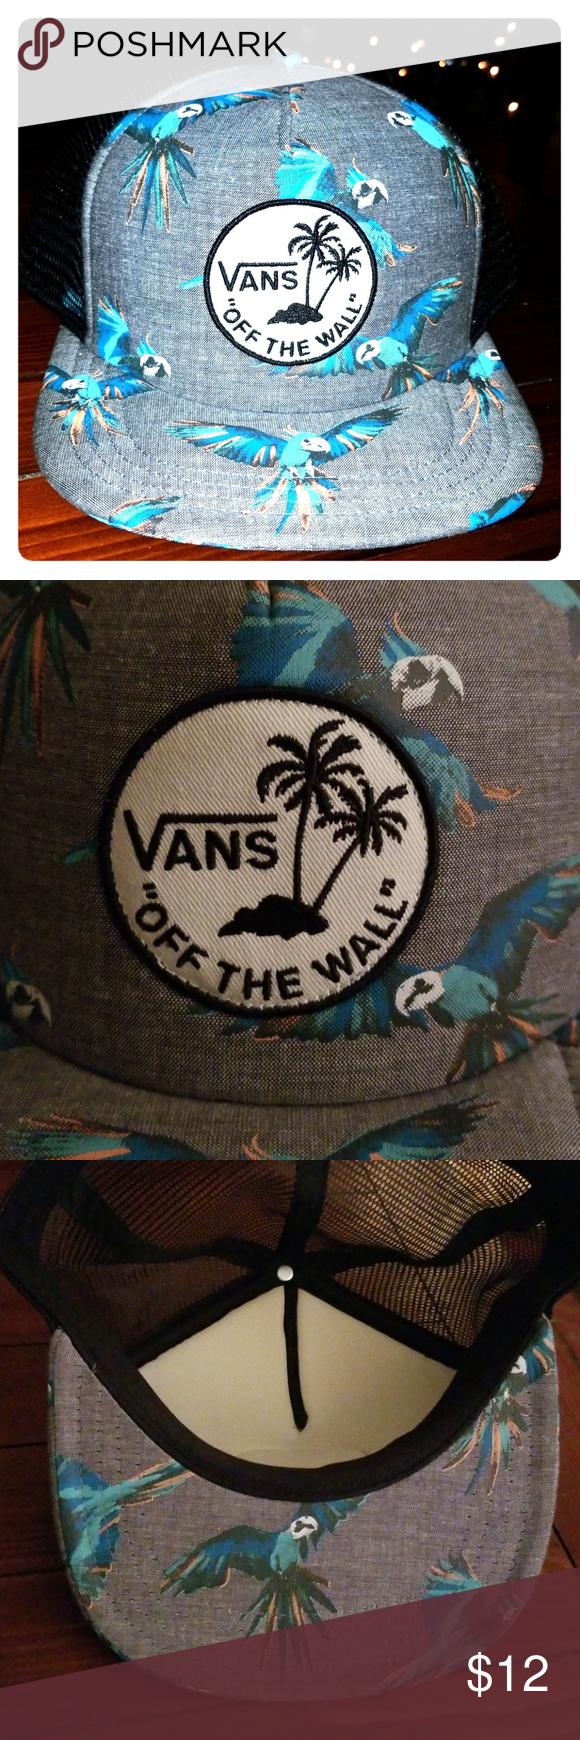 89530ec47a6 Vans Parrot Trucker Hat Pre owned Snap back Trucker Style Vans Accessories  Hats